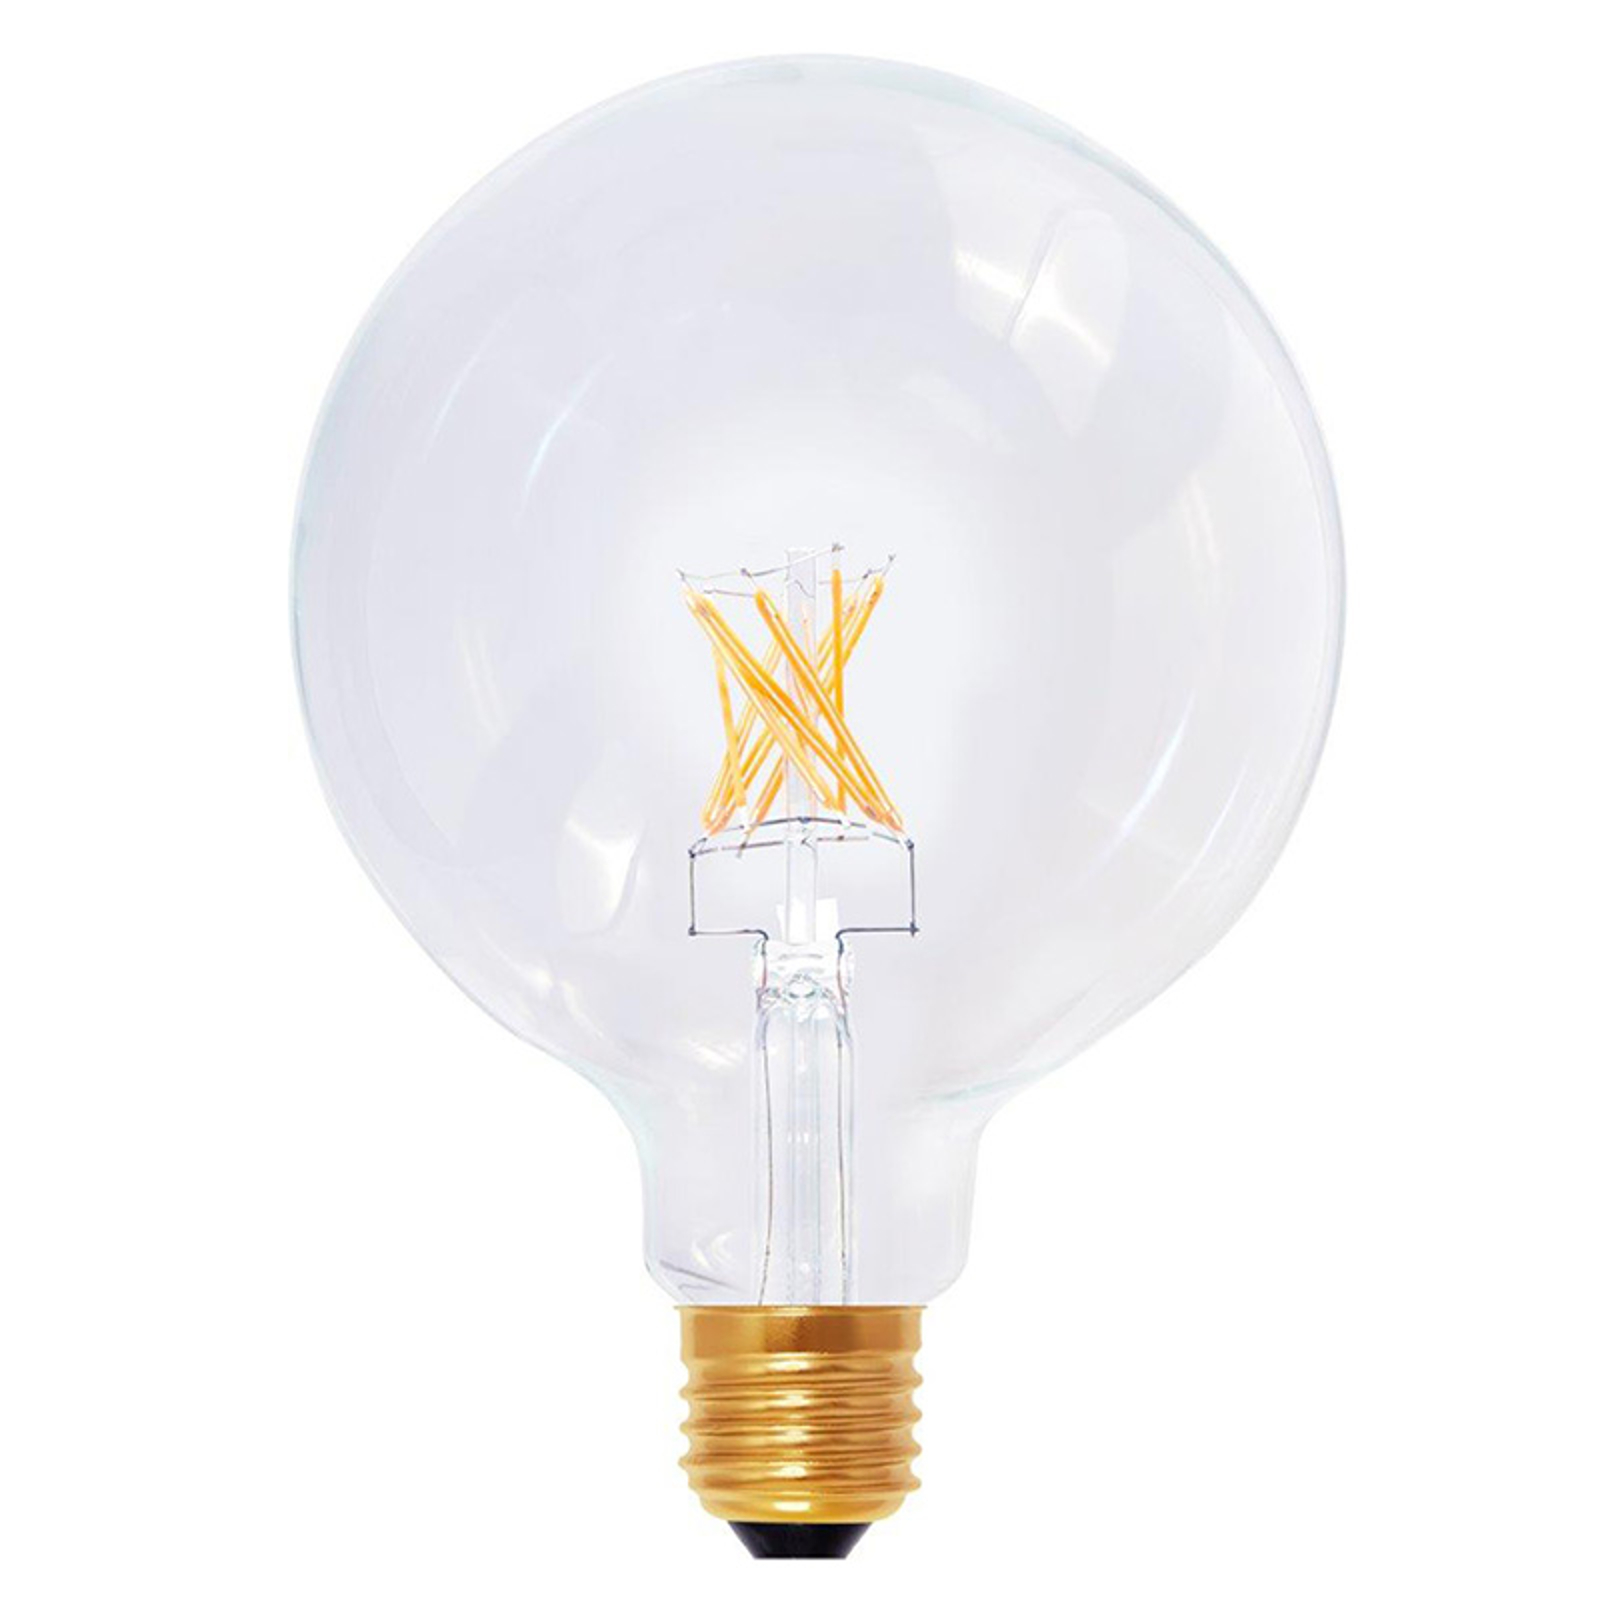 E27 8 W 922 LED-globepære G125 med glødetråder